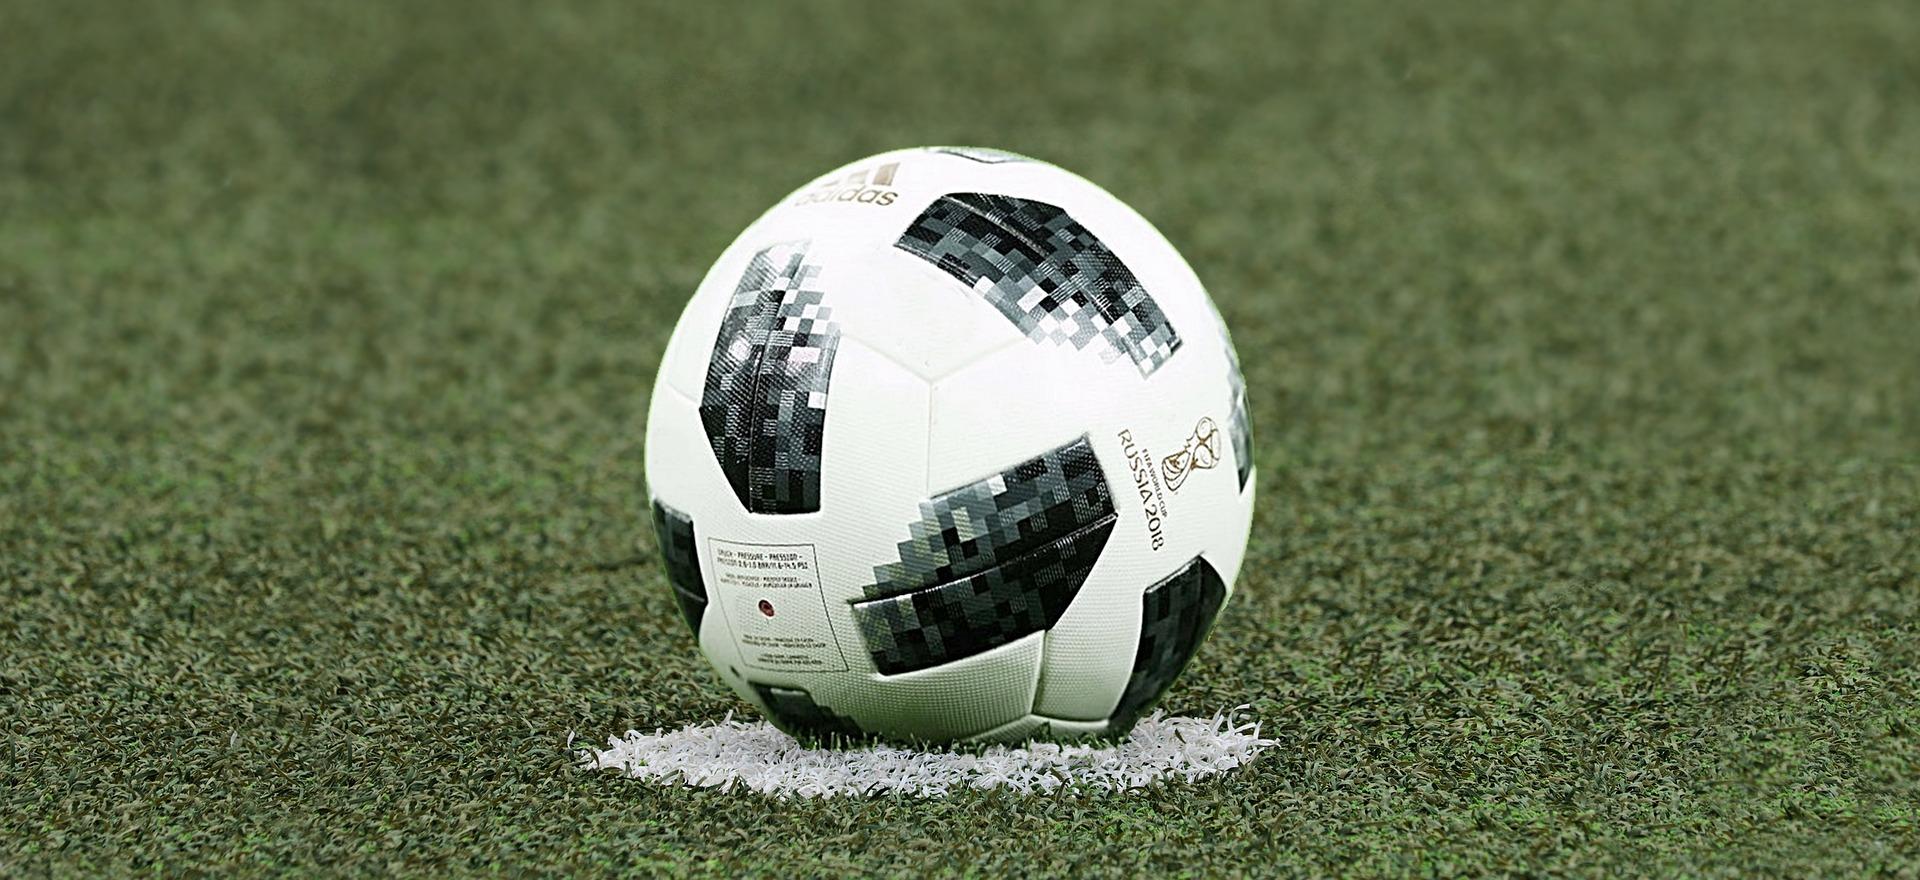 football-3475163_1920.jpg